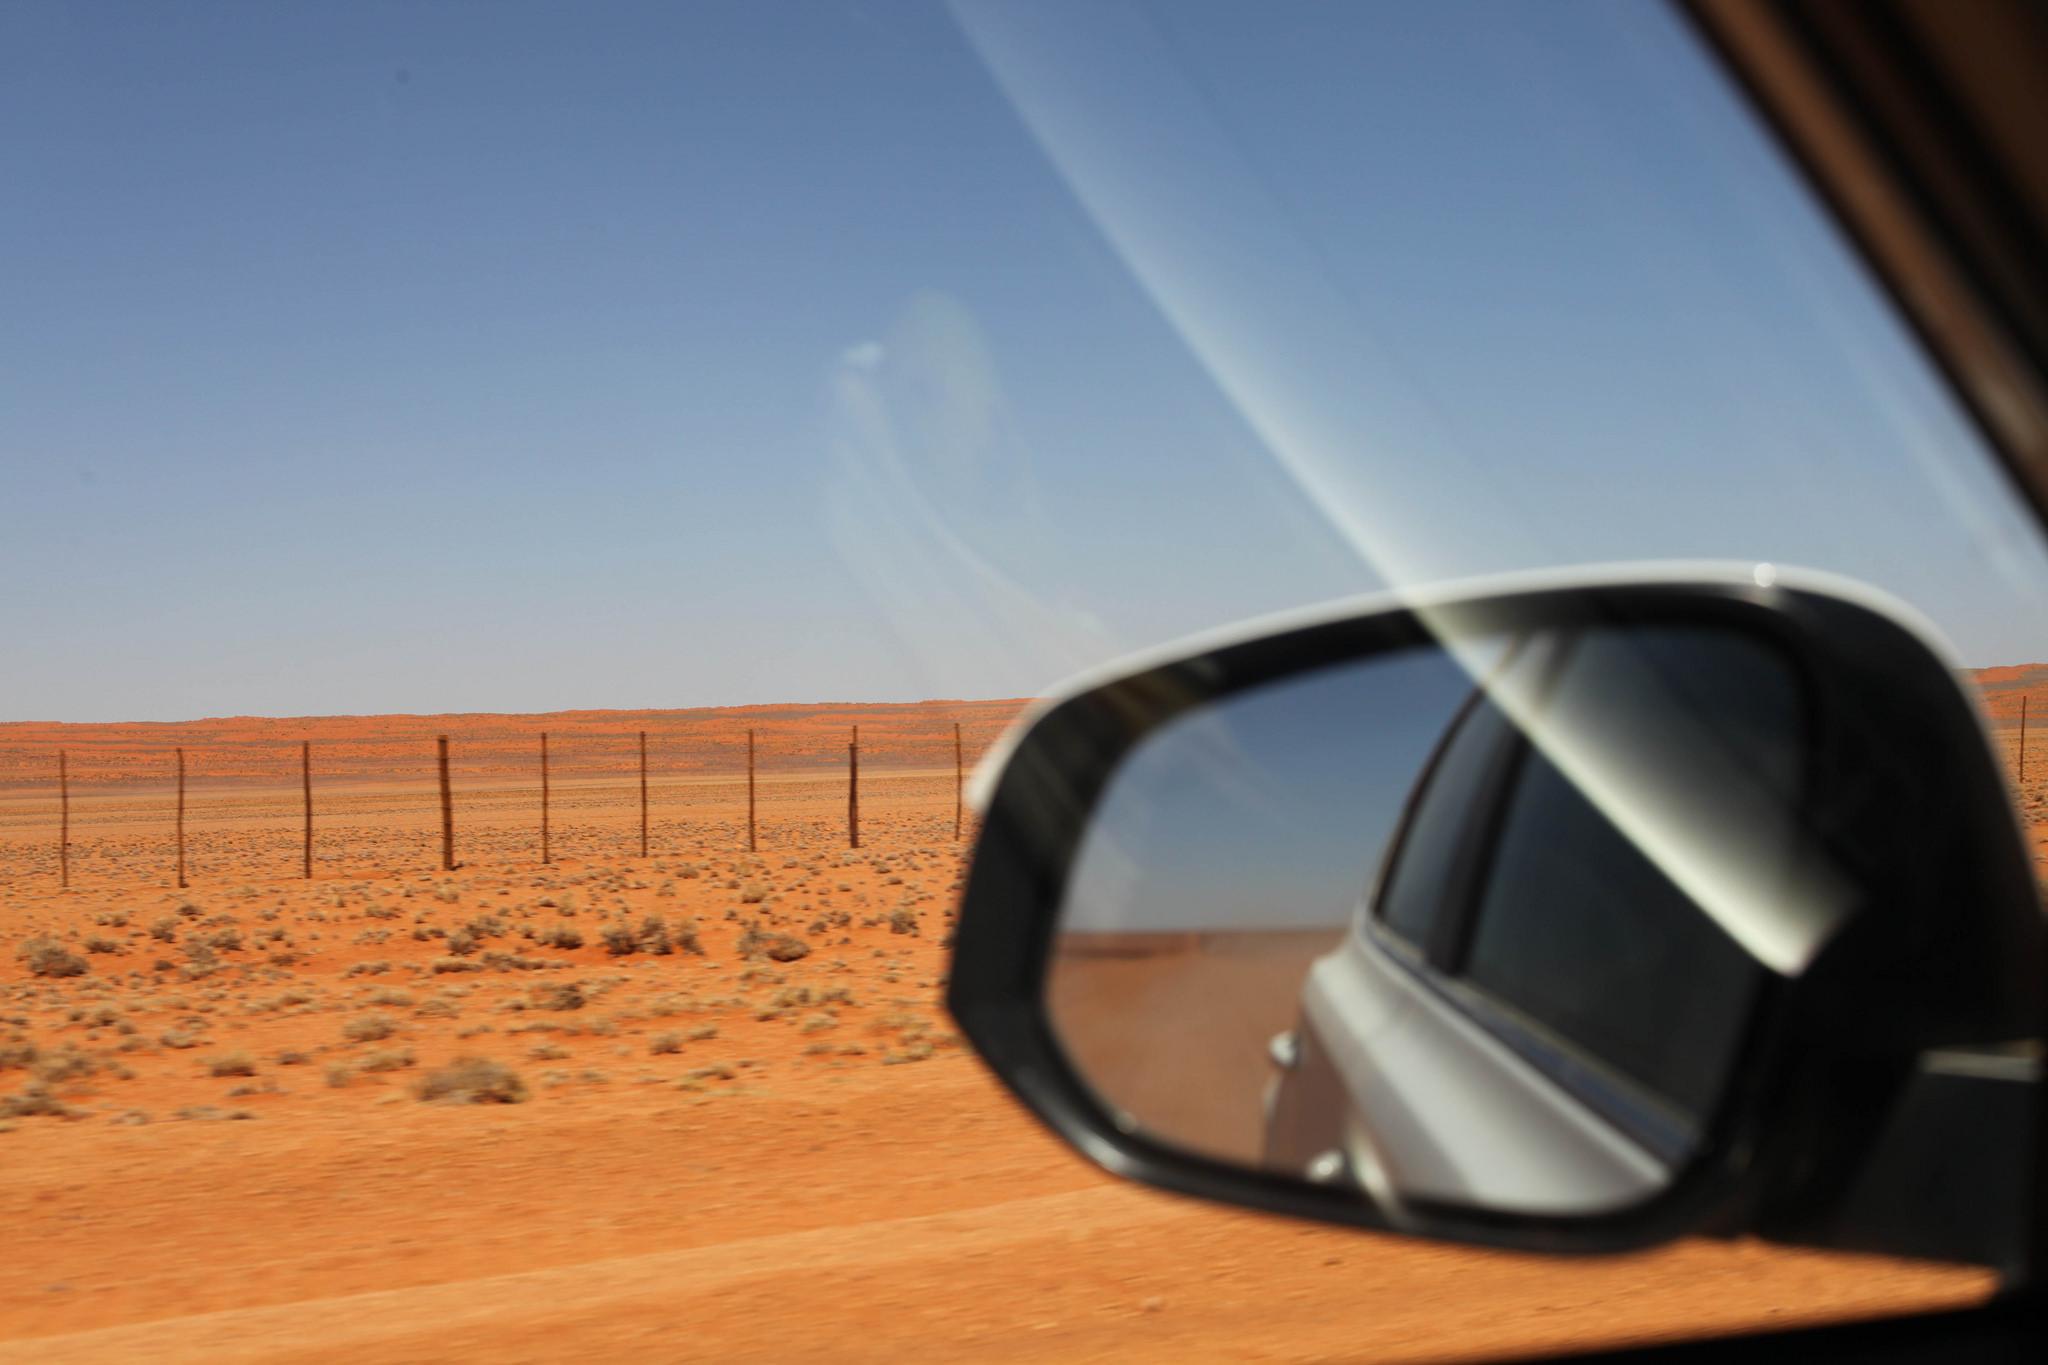 drivig on the D707 along the edge of the Namib desert